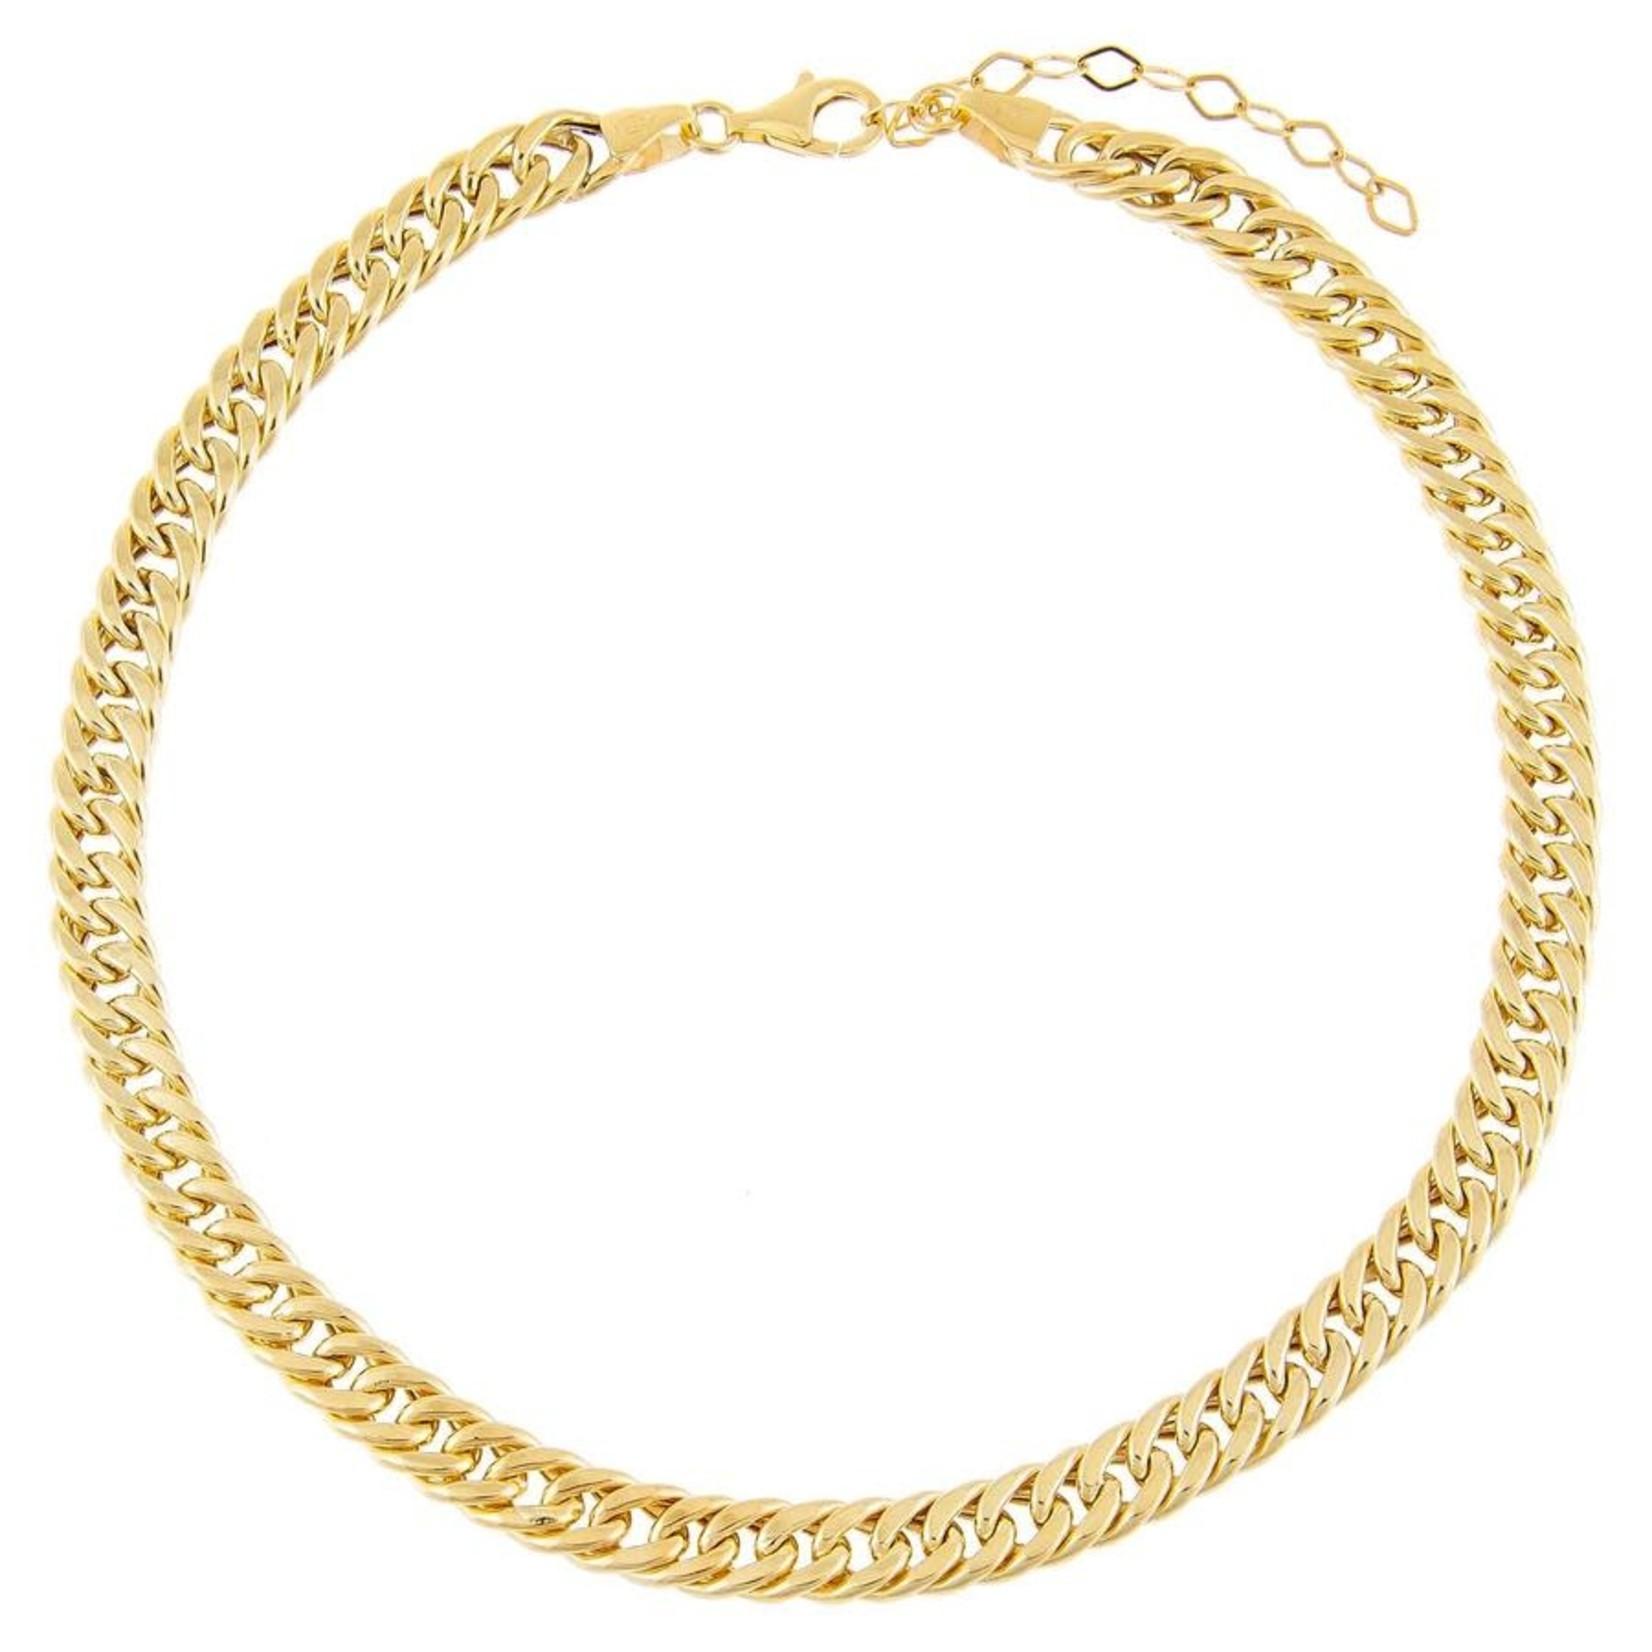 Adinas Hollow Double Curb Chain Choker